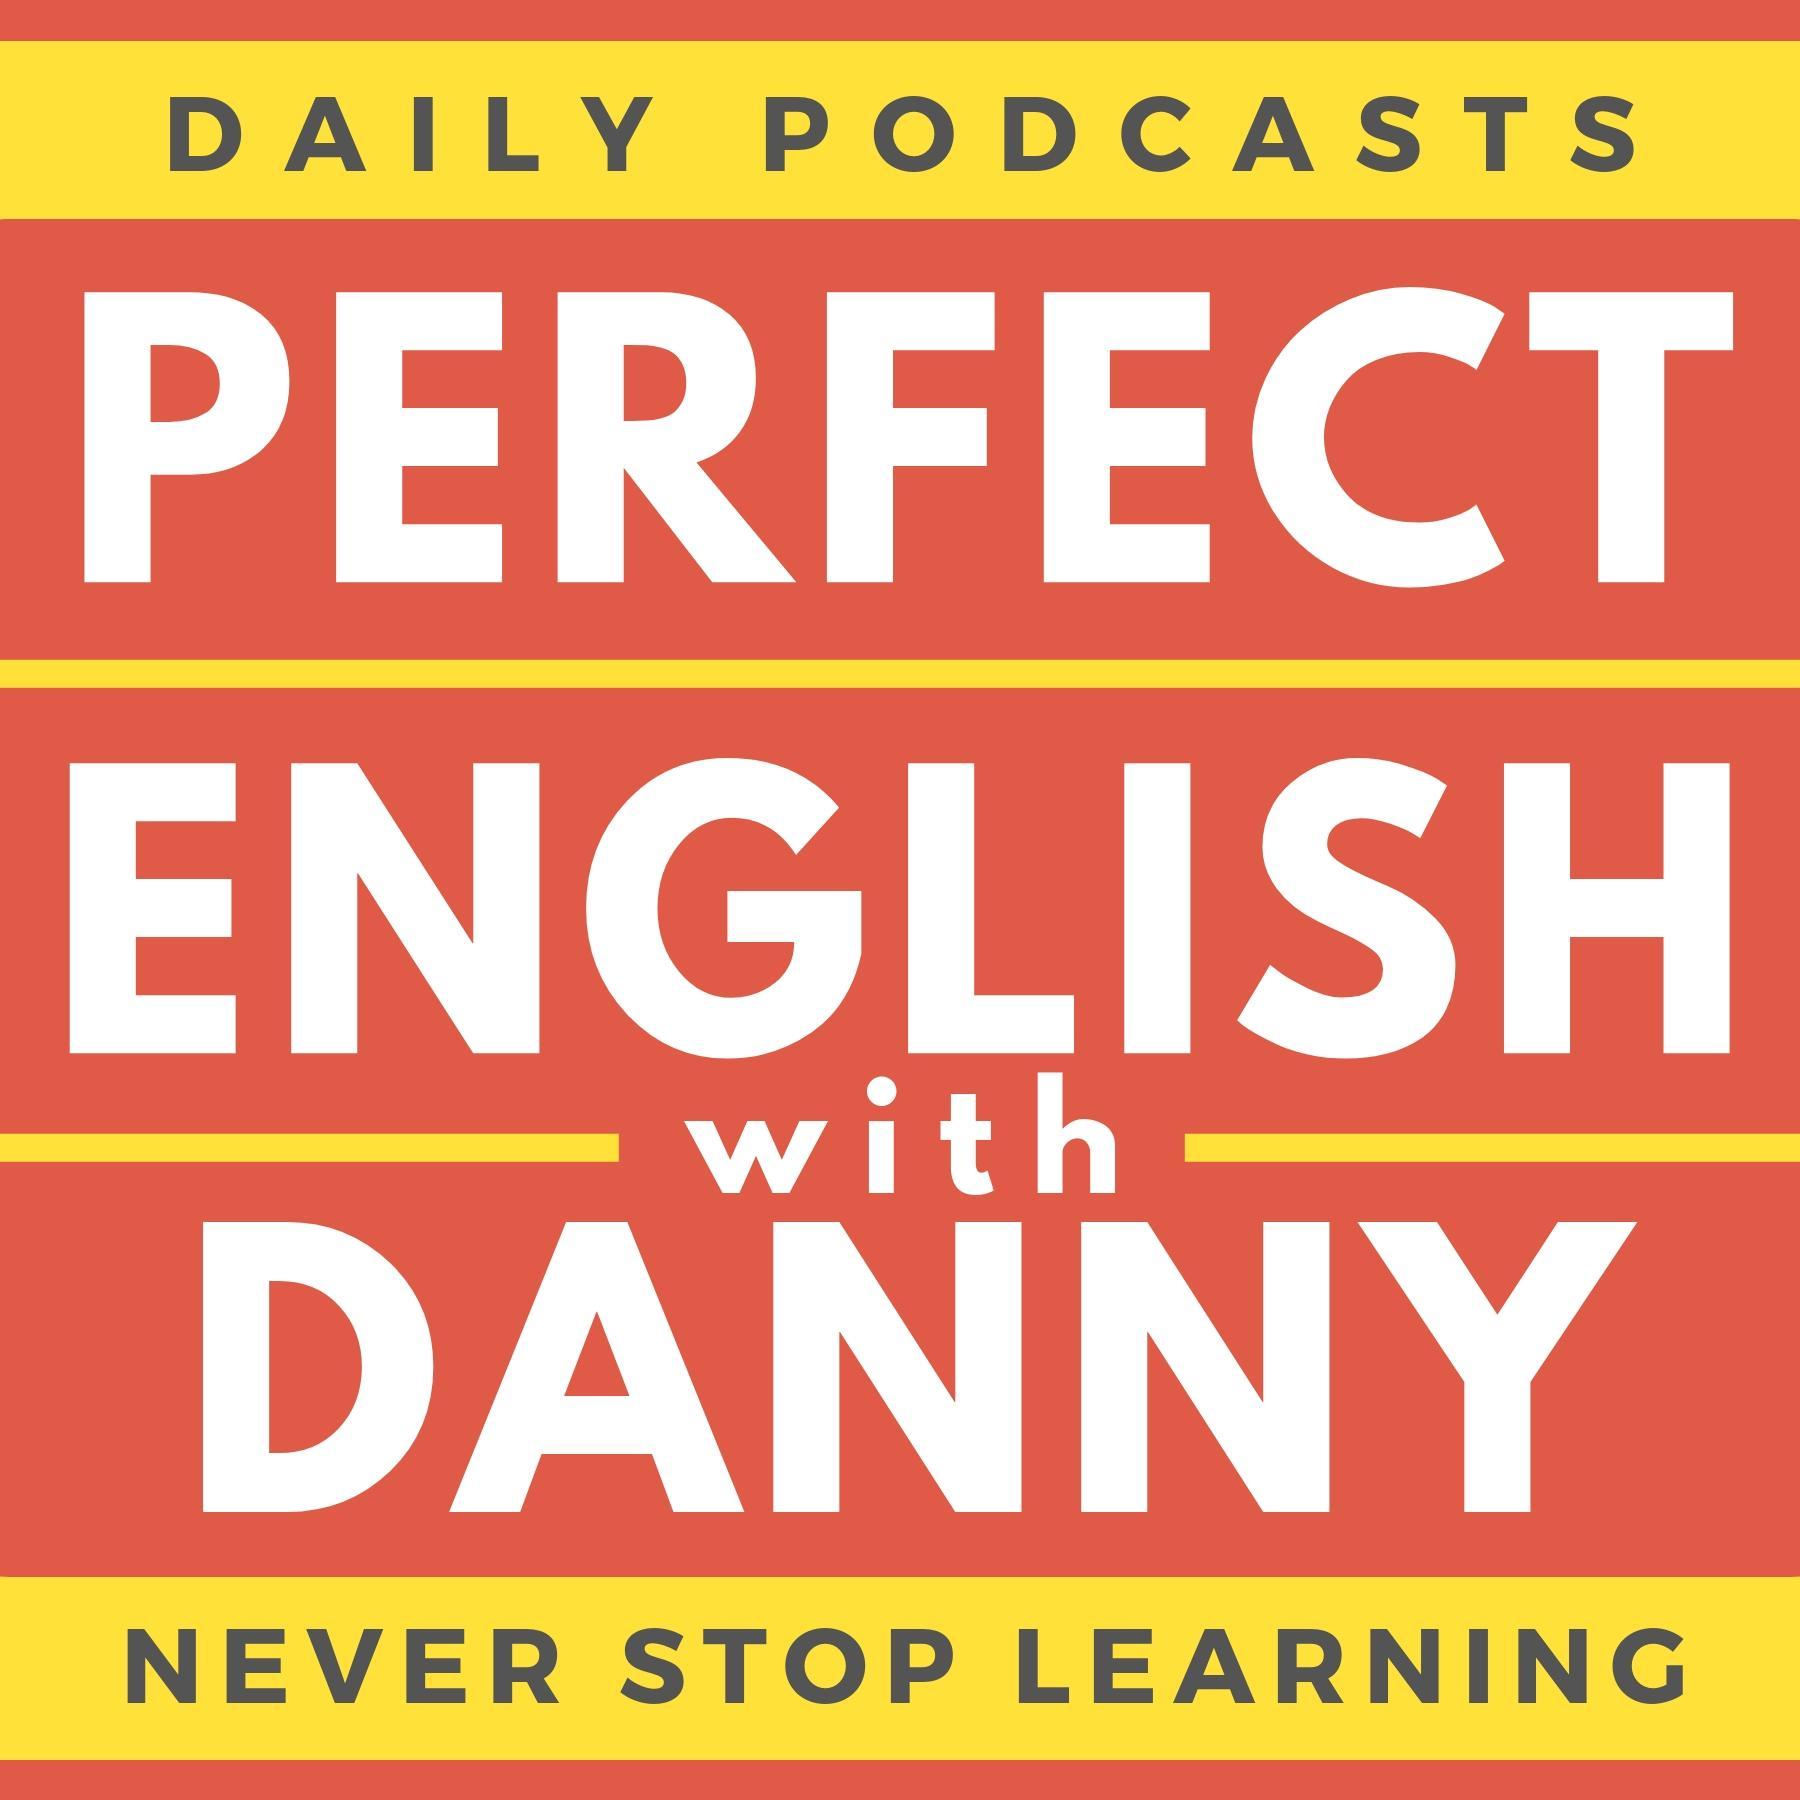 Episode 135 - Vocabulary Builder - Describing Personality 1-5